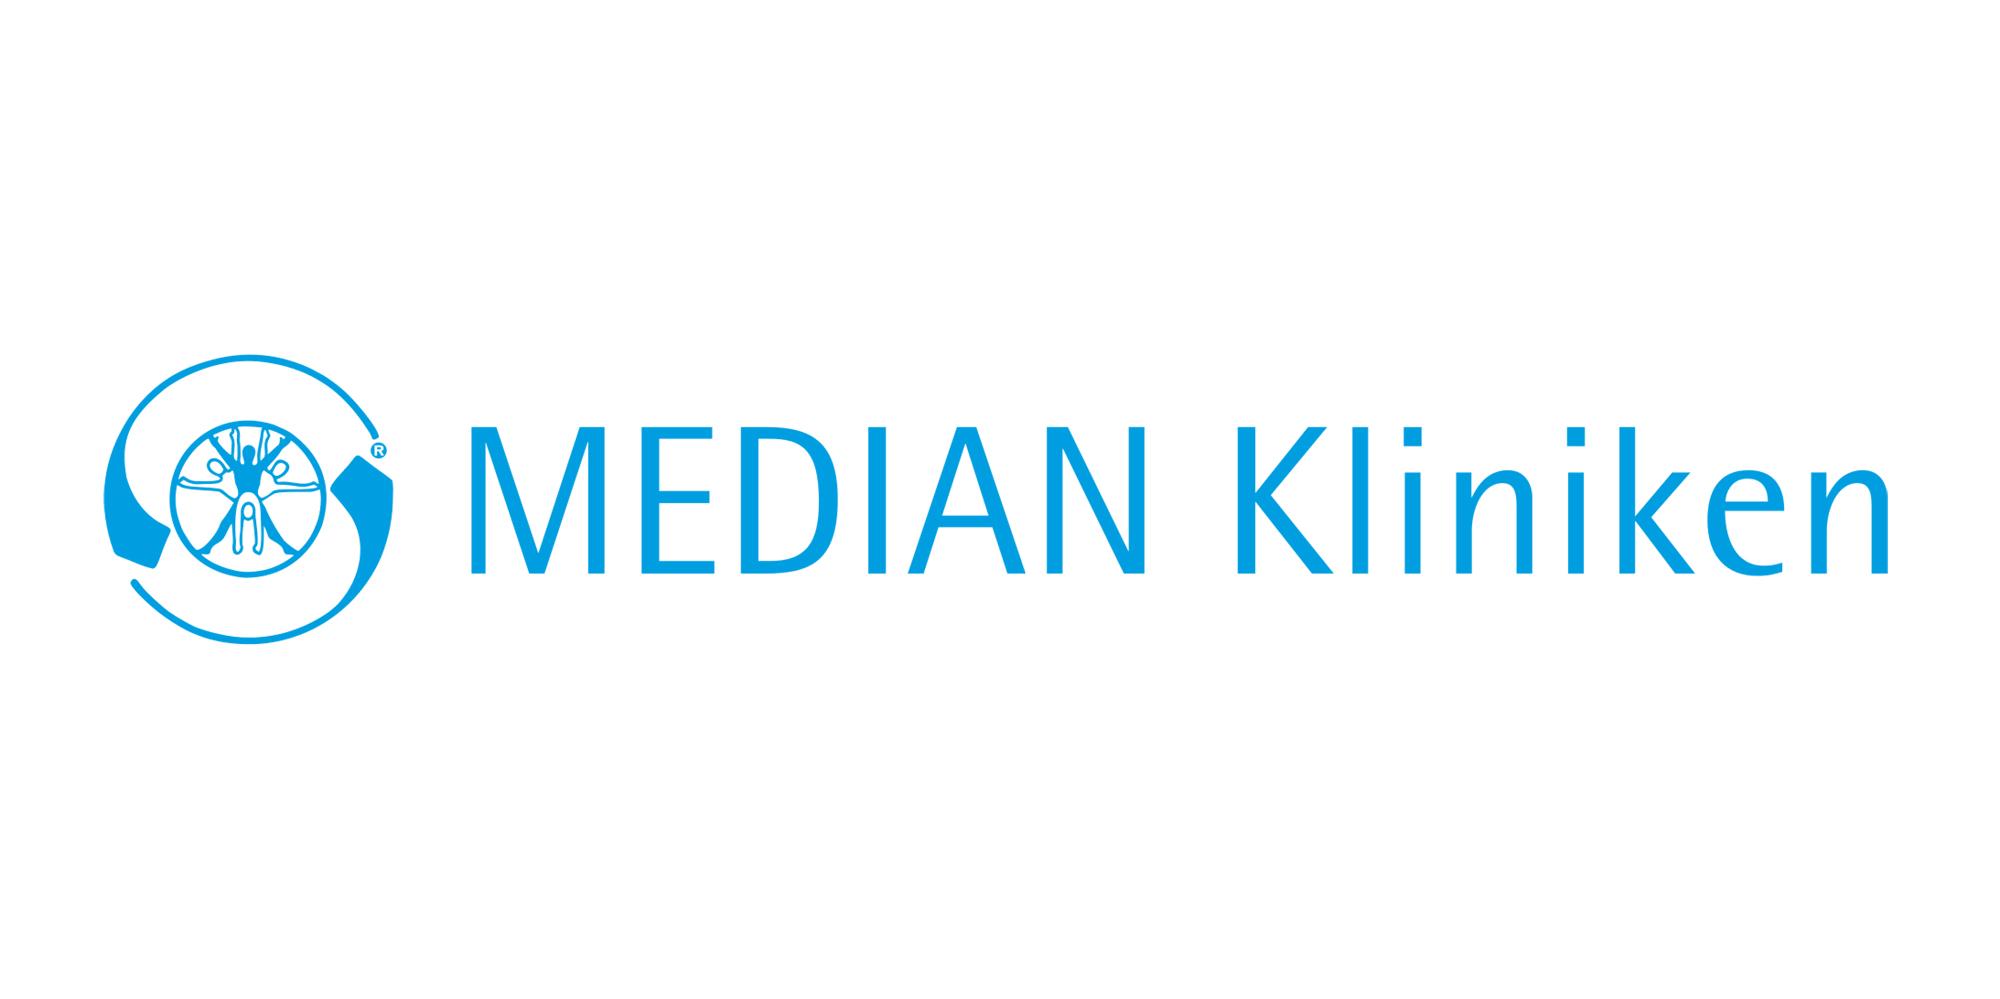 2000px-Logo_MEDIAN_Kliniken_svg Kopie_2000x1000.jpg